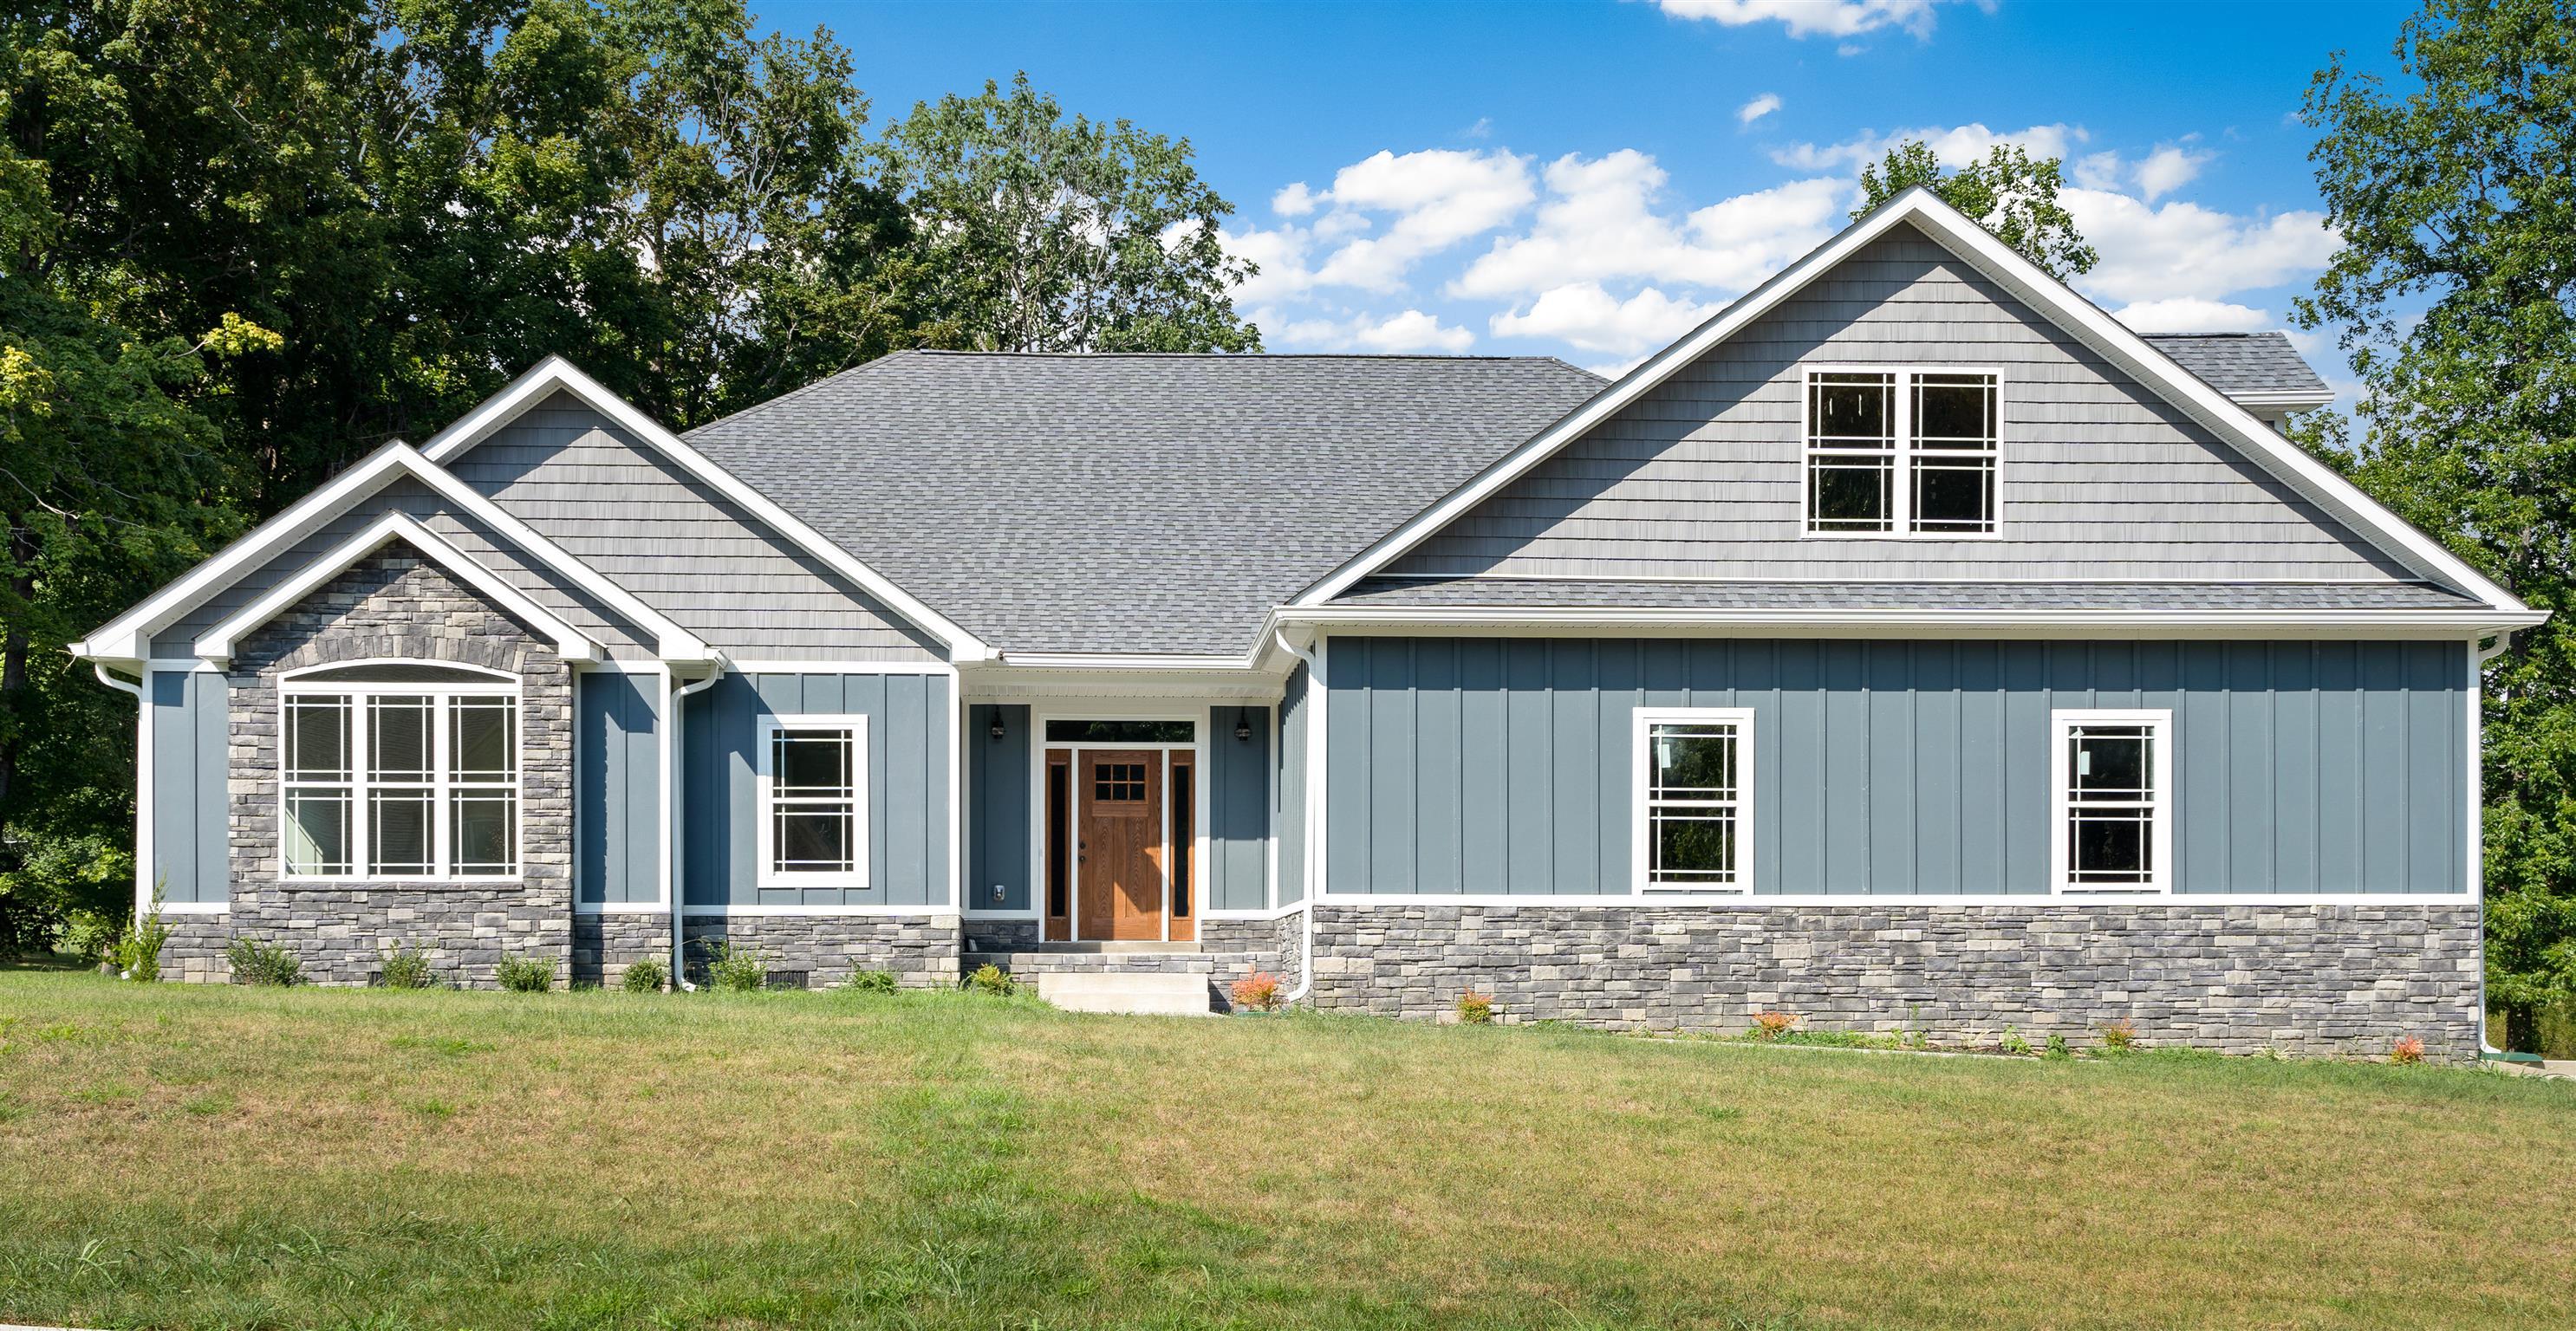 213 Markie Drive, Clarksville, TN 37043 - Clarksville, TN real estate listing